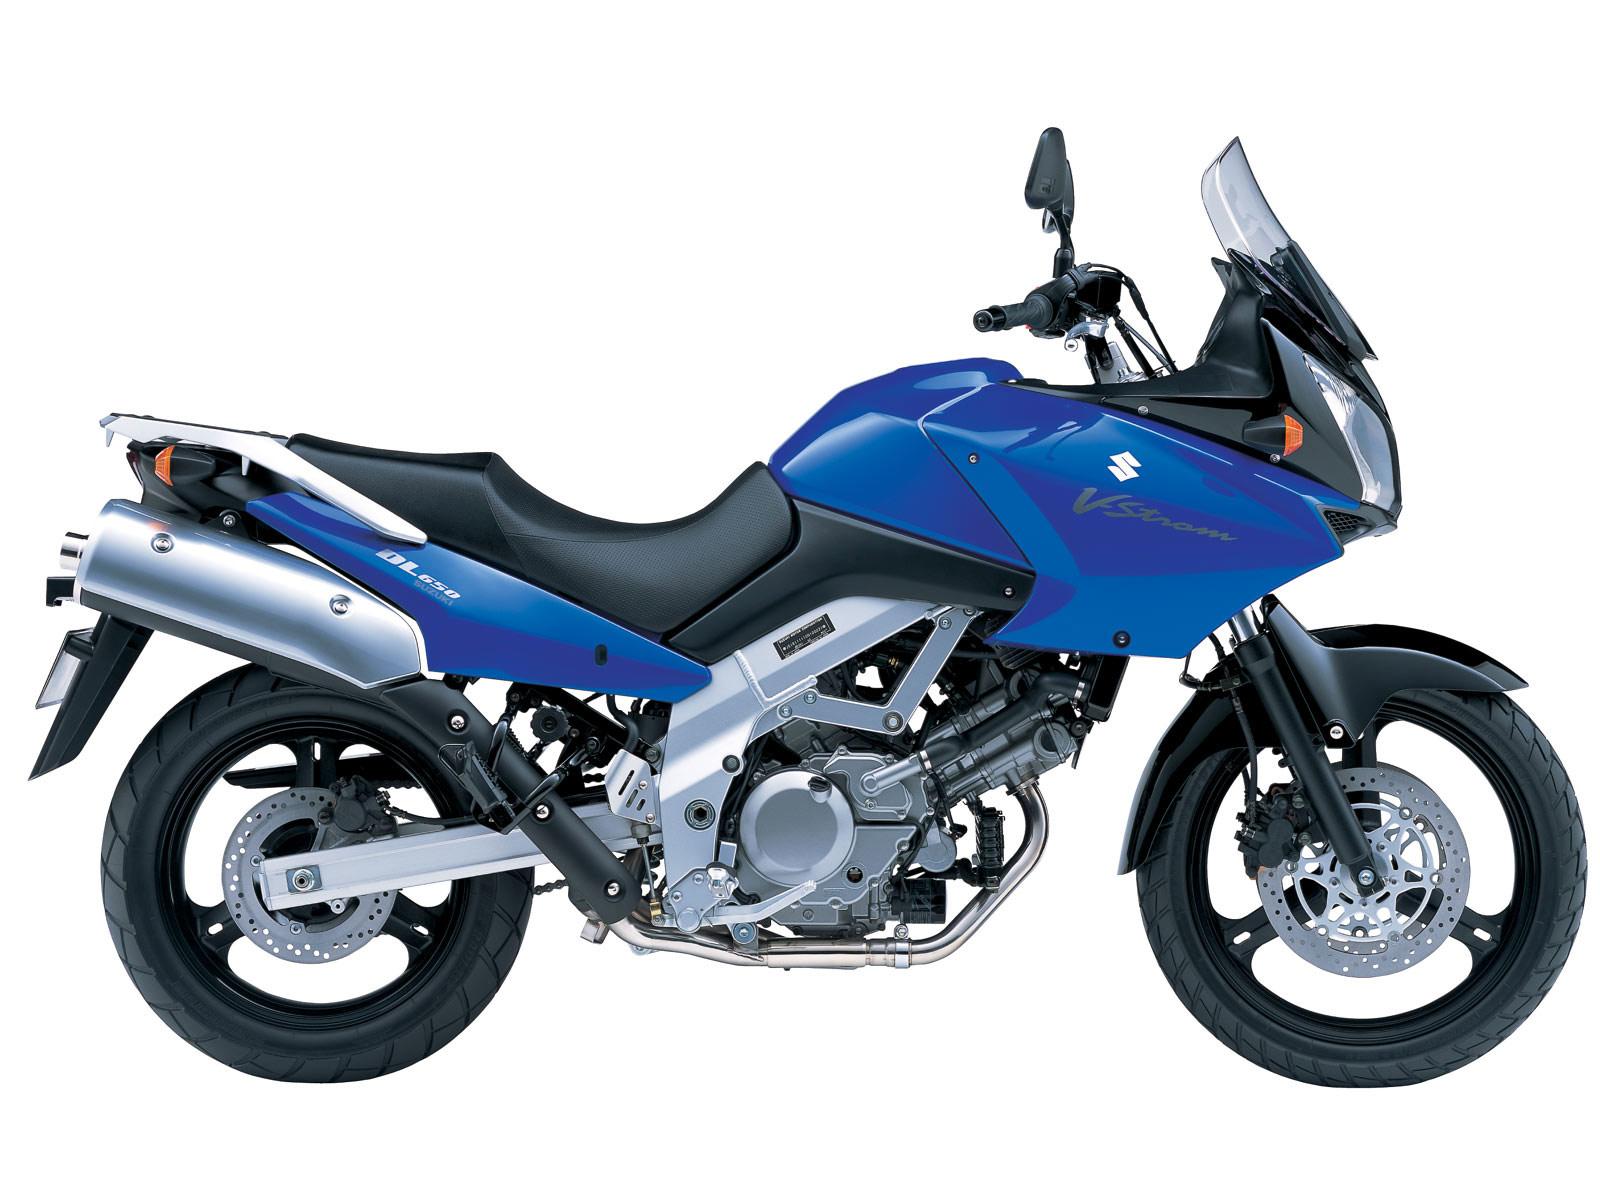 http://4.bp.blogspot.com/-FVHjSW7ArT0/TkhLnnybnSI/AAAAAAAAAfQ/AFdYBOgwtxg/s1600/Suzuki-DL-650_V-Strom_2004_motorcycle-desktop-wallpaper_07.jpg